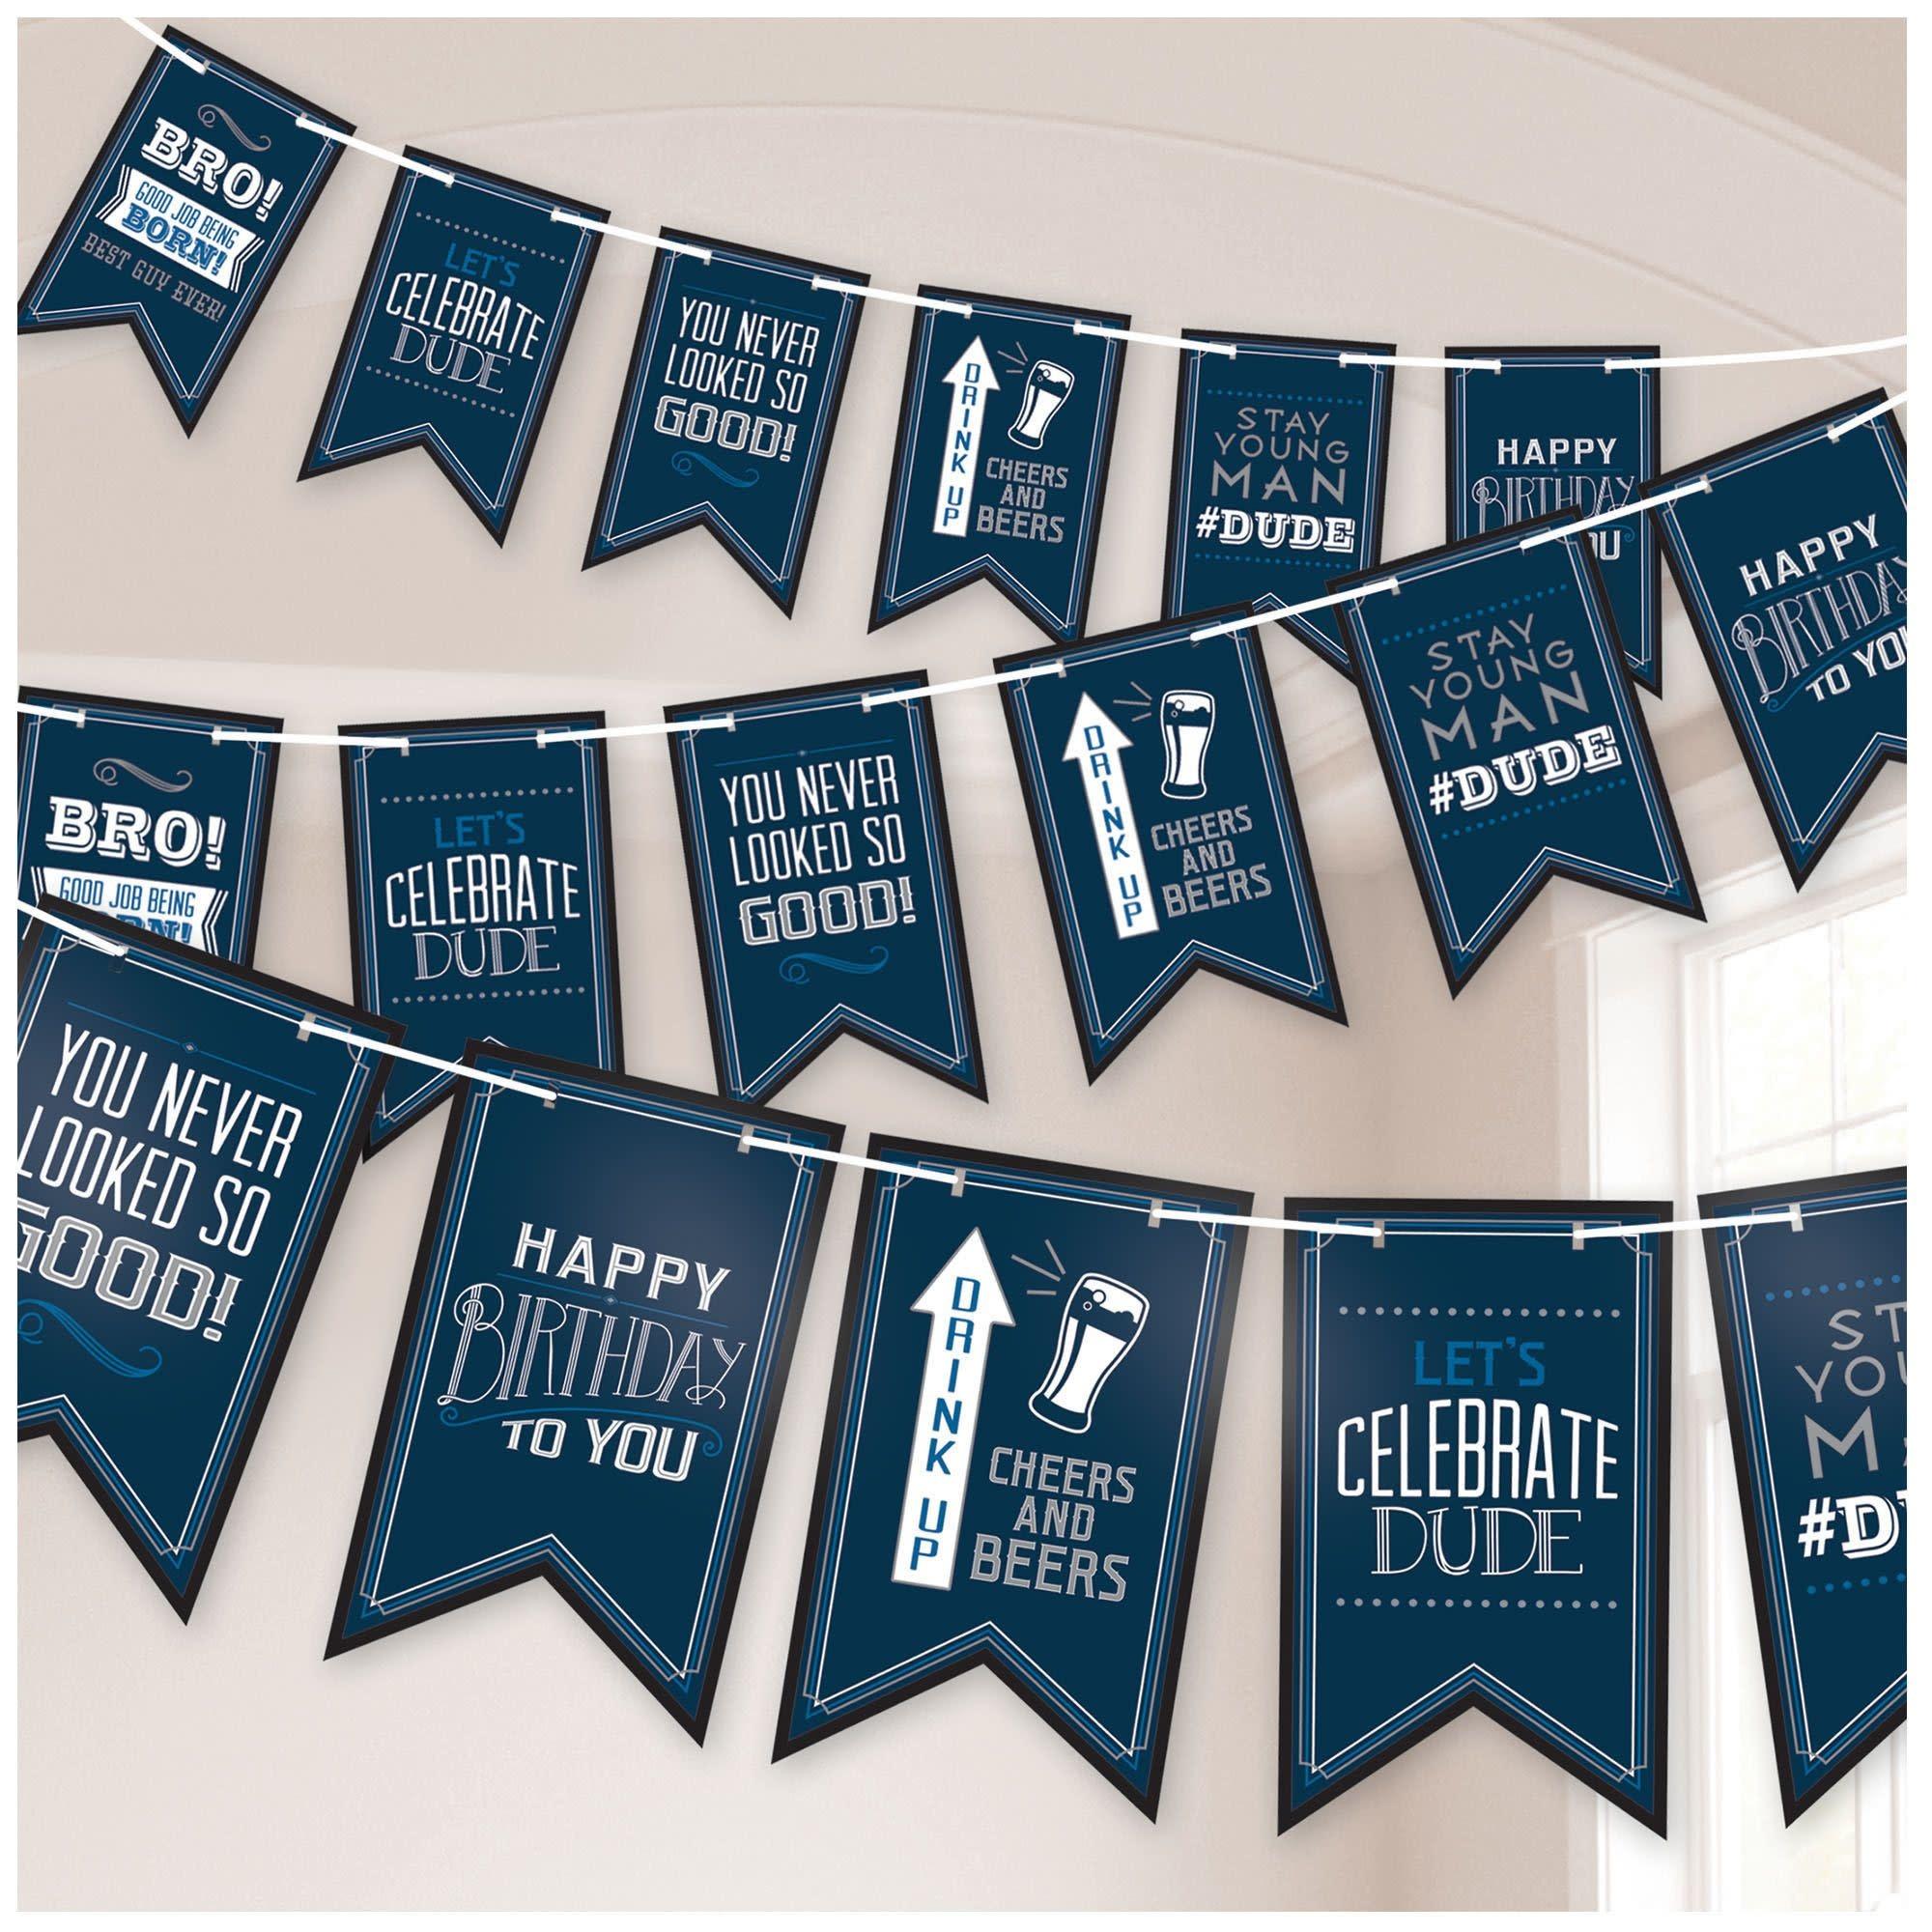 Happy Birthday Man Pennant Banner